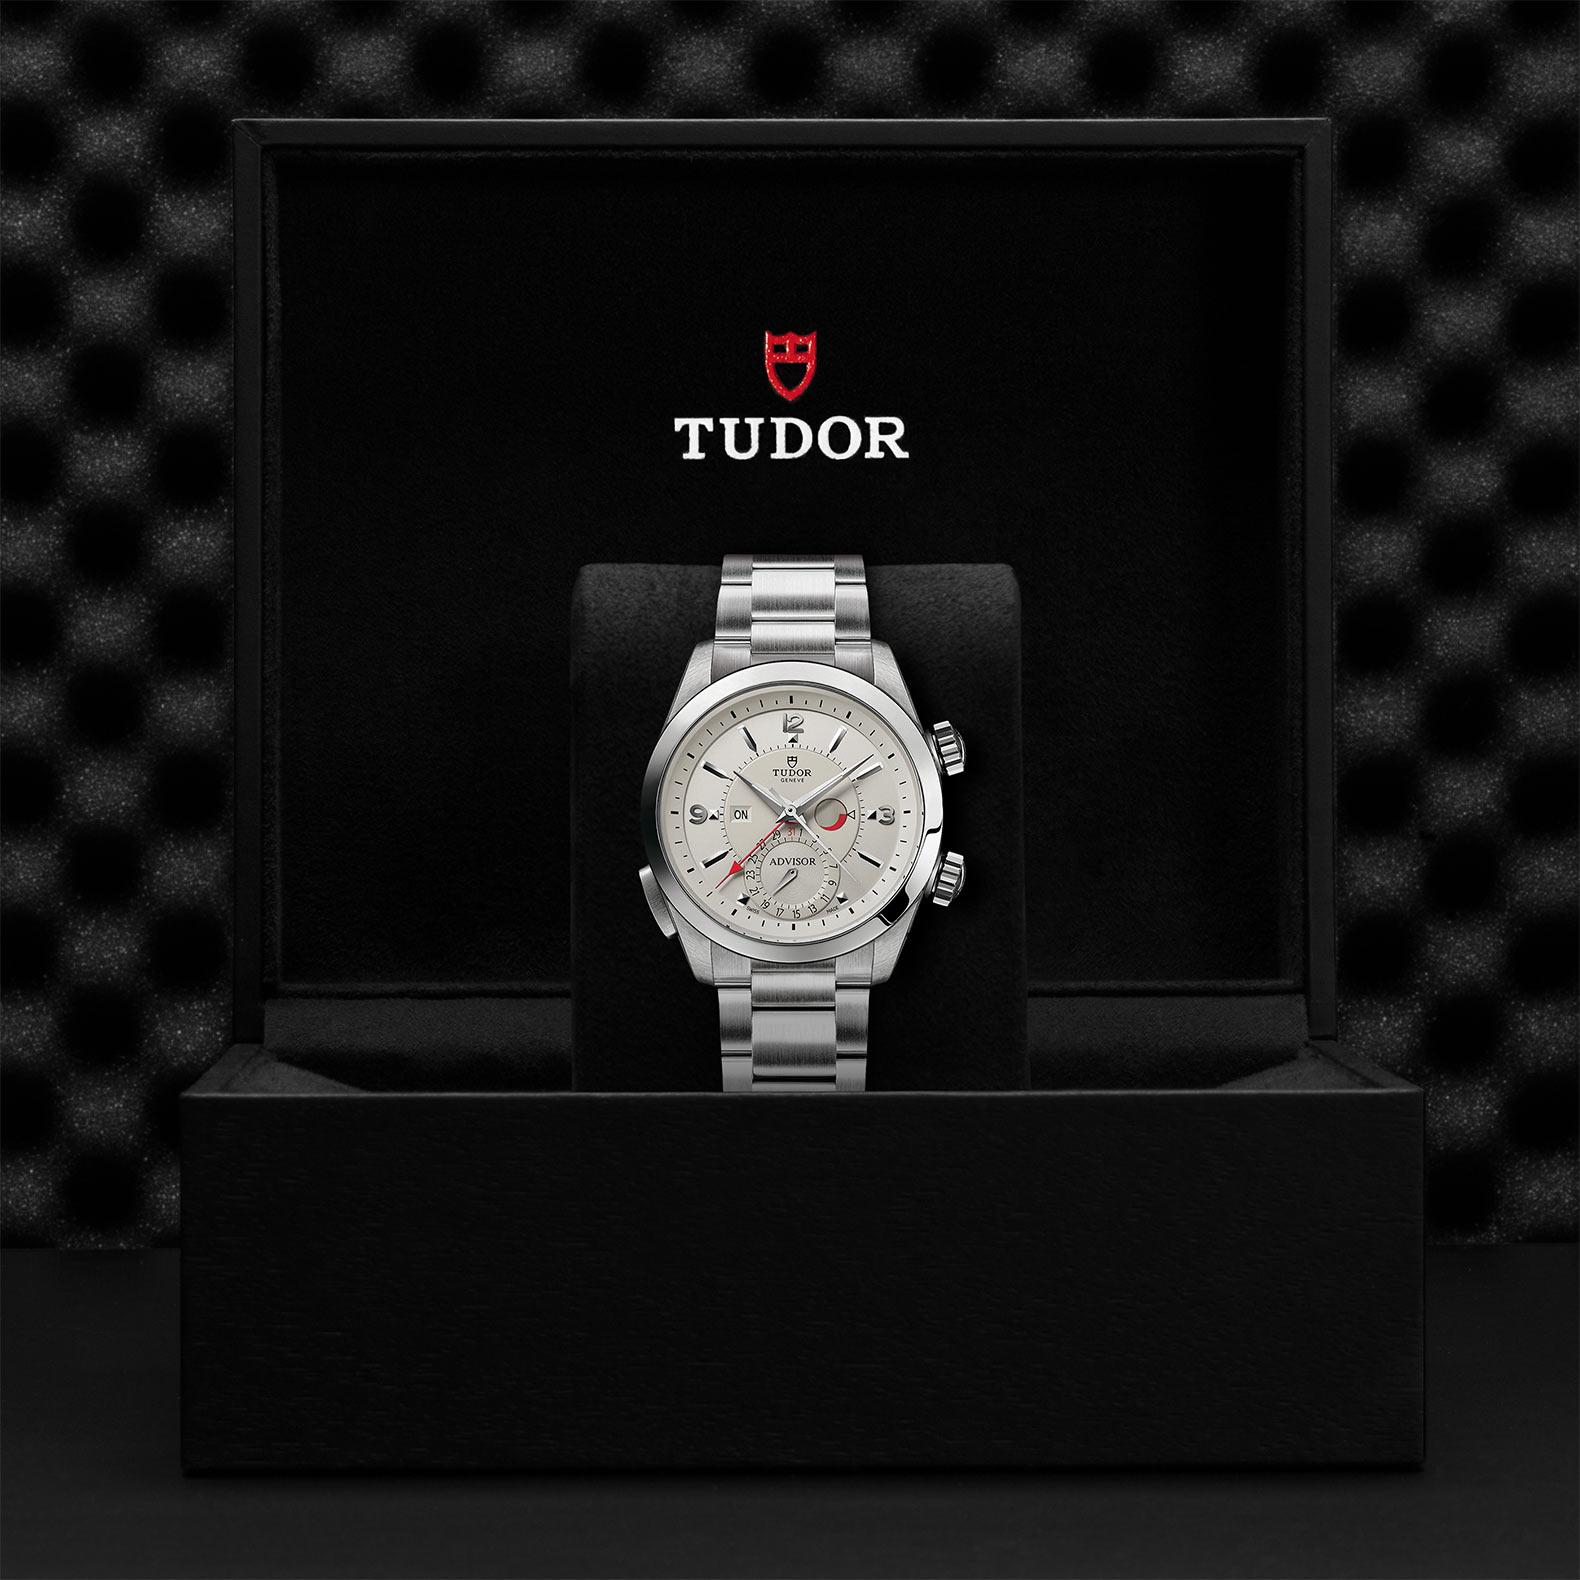 TUDOR Heritage Advisor - M79620T-0010